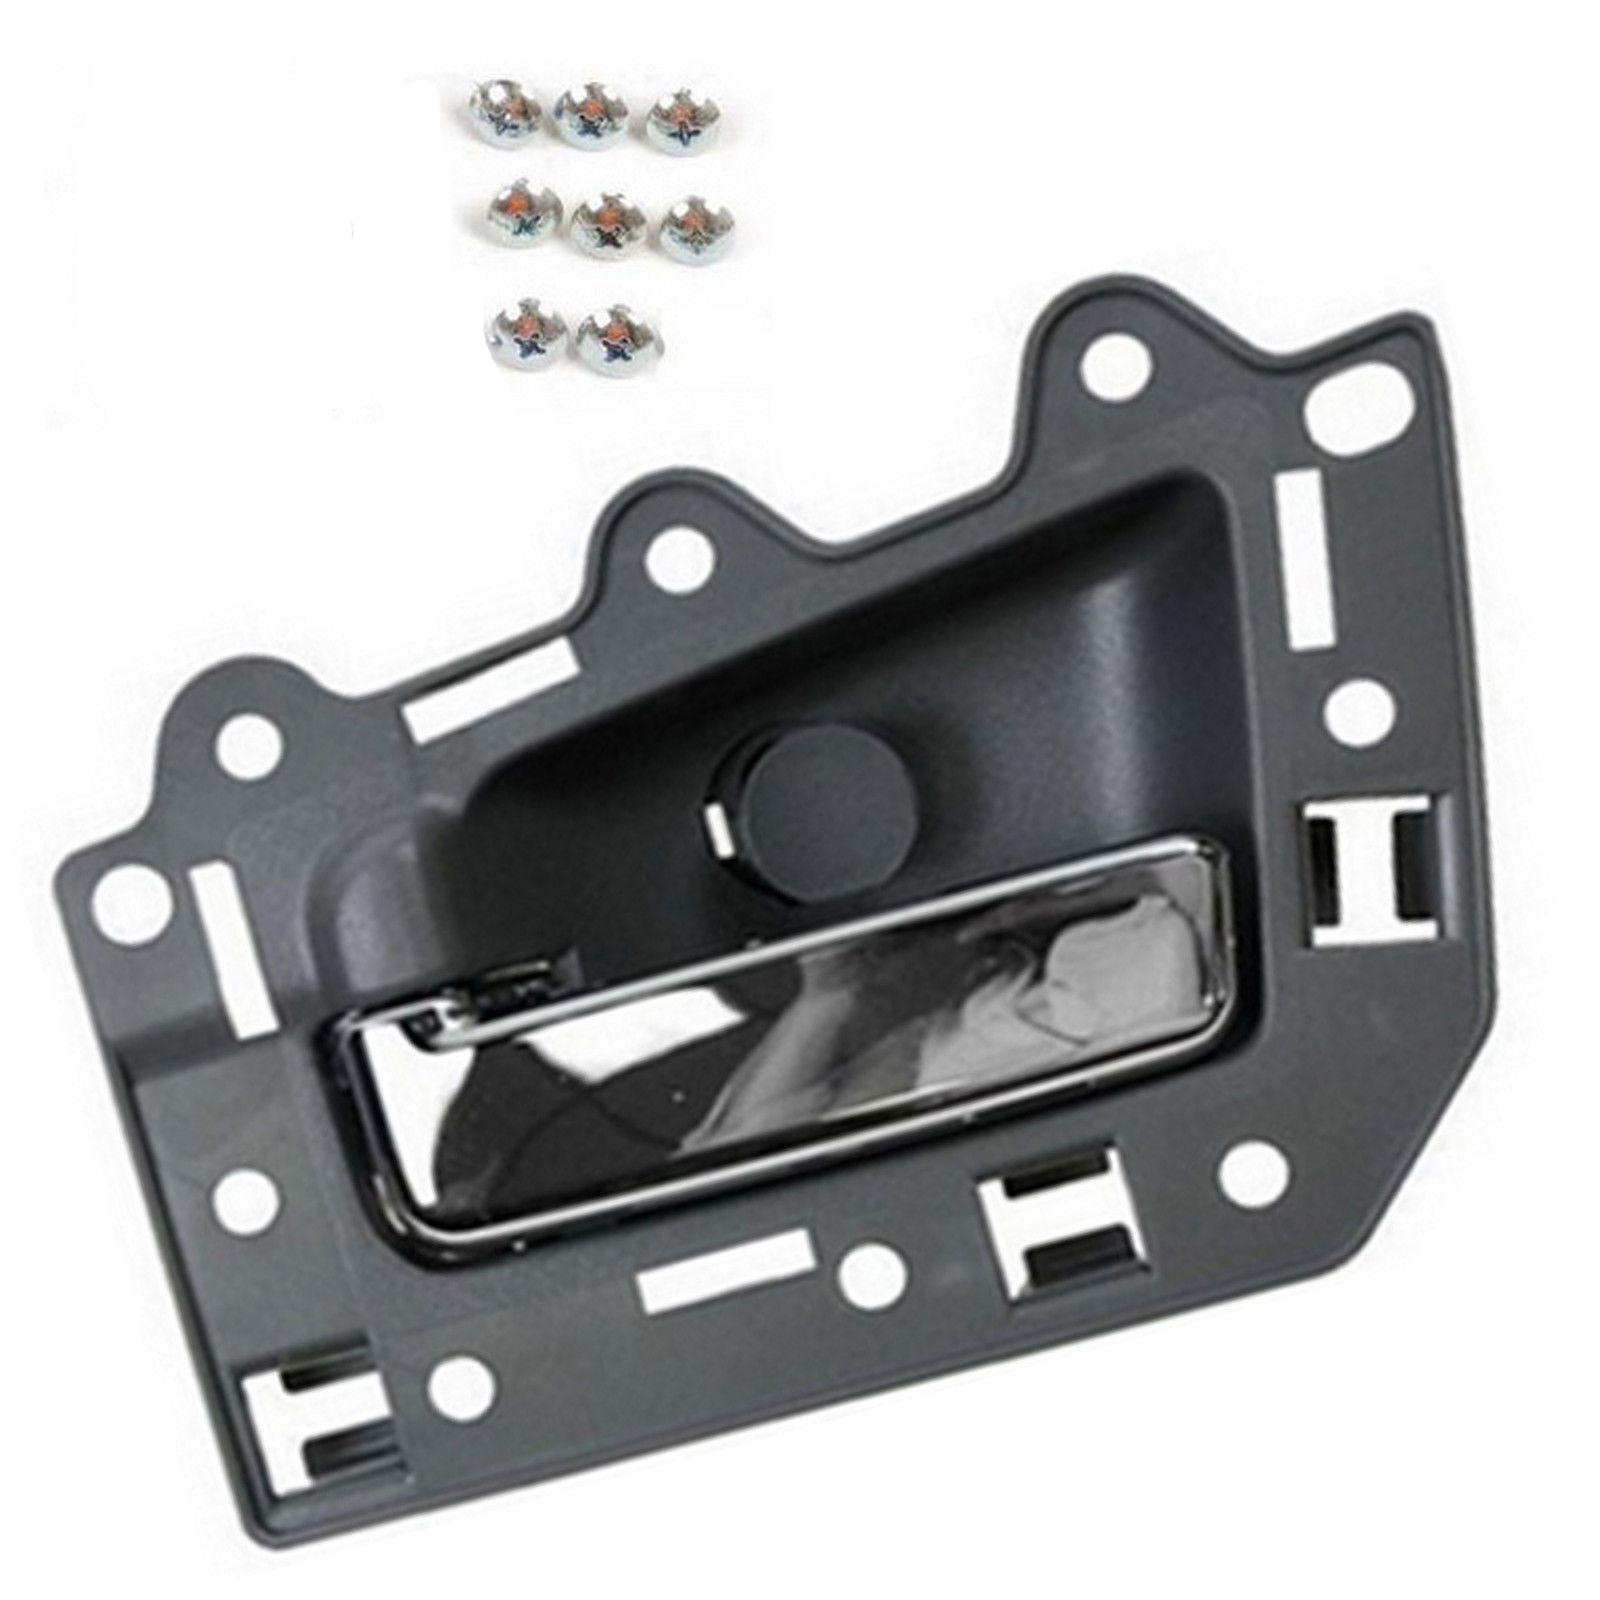 For 05-11 Jeep Grand Cherokee BJ0007 Rear Left Inside Door Handle Gray /& chrome